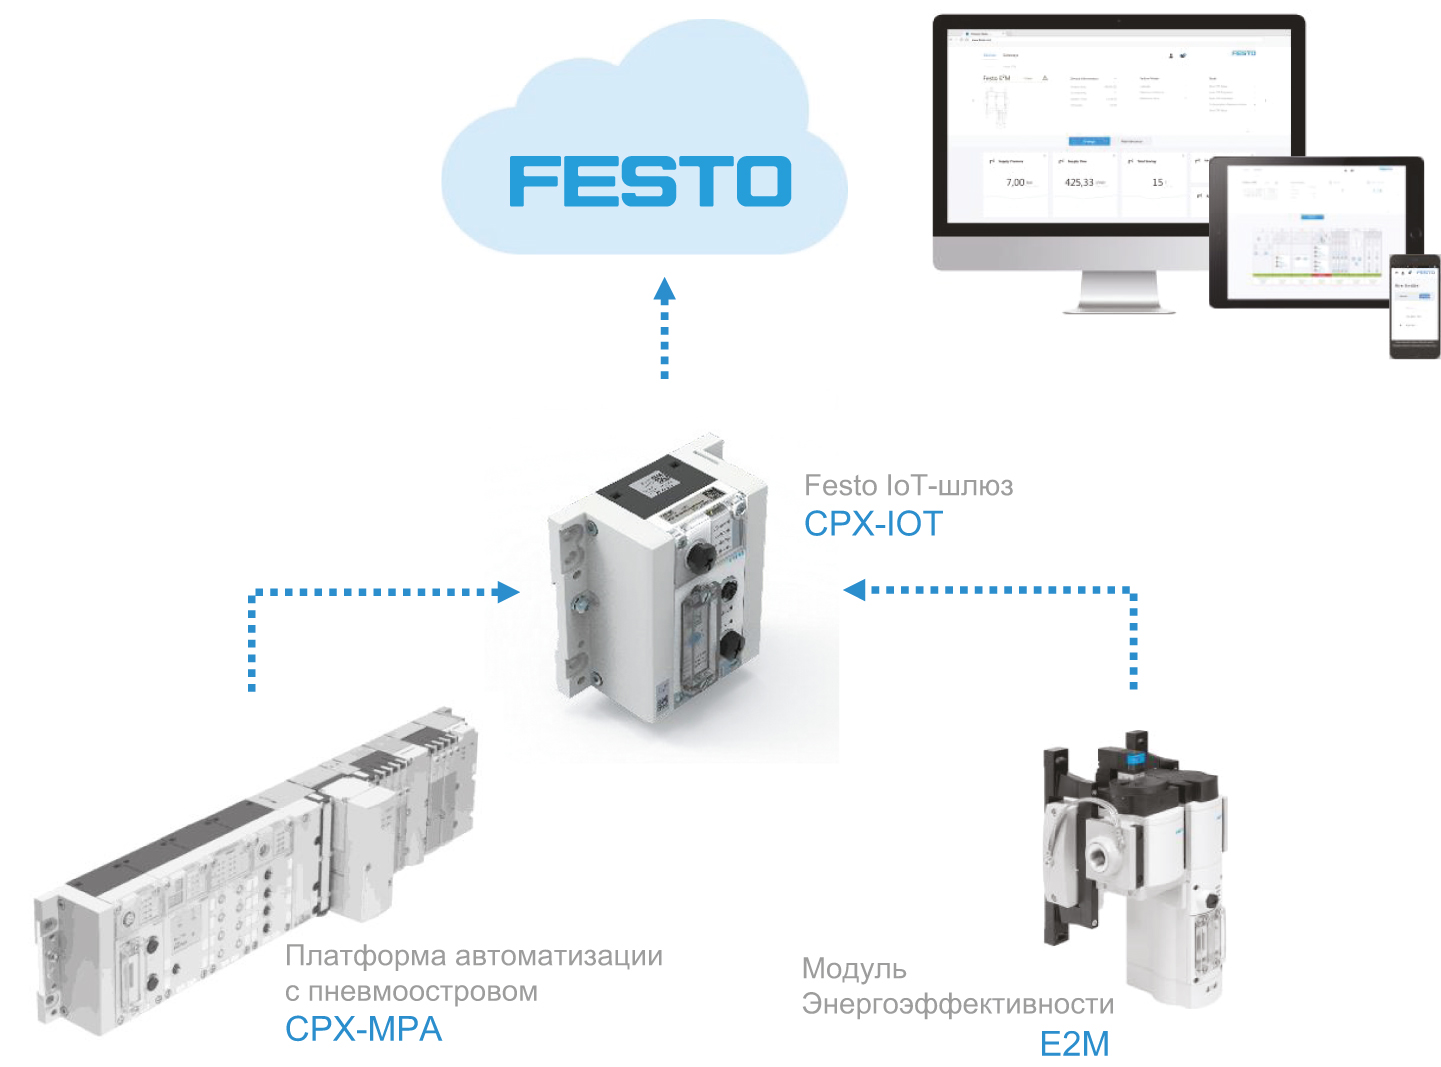 Интеграция устройств Festo